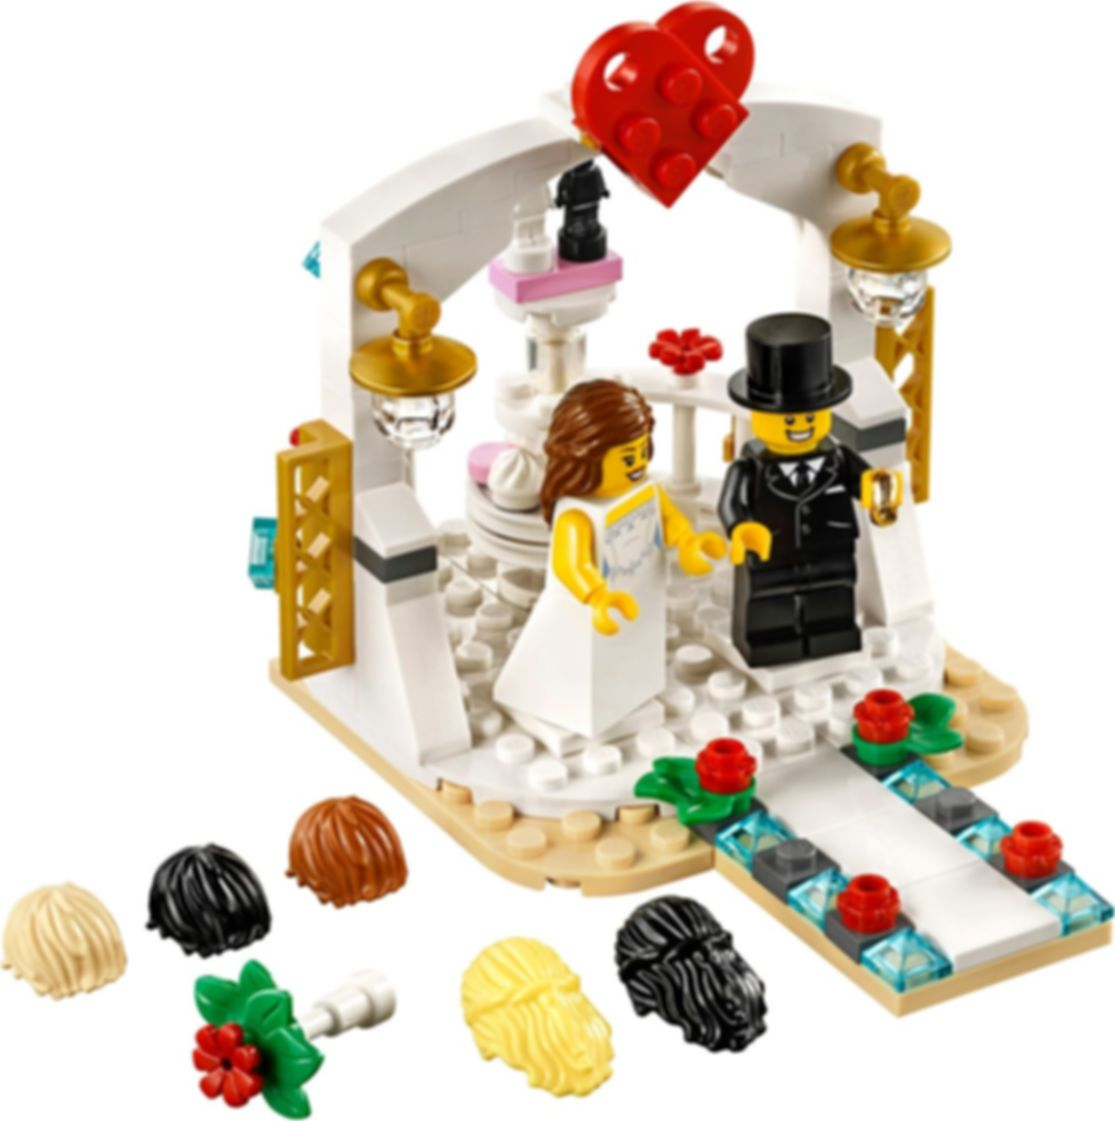 Wedding Favor Set 2018 components